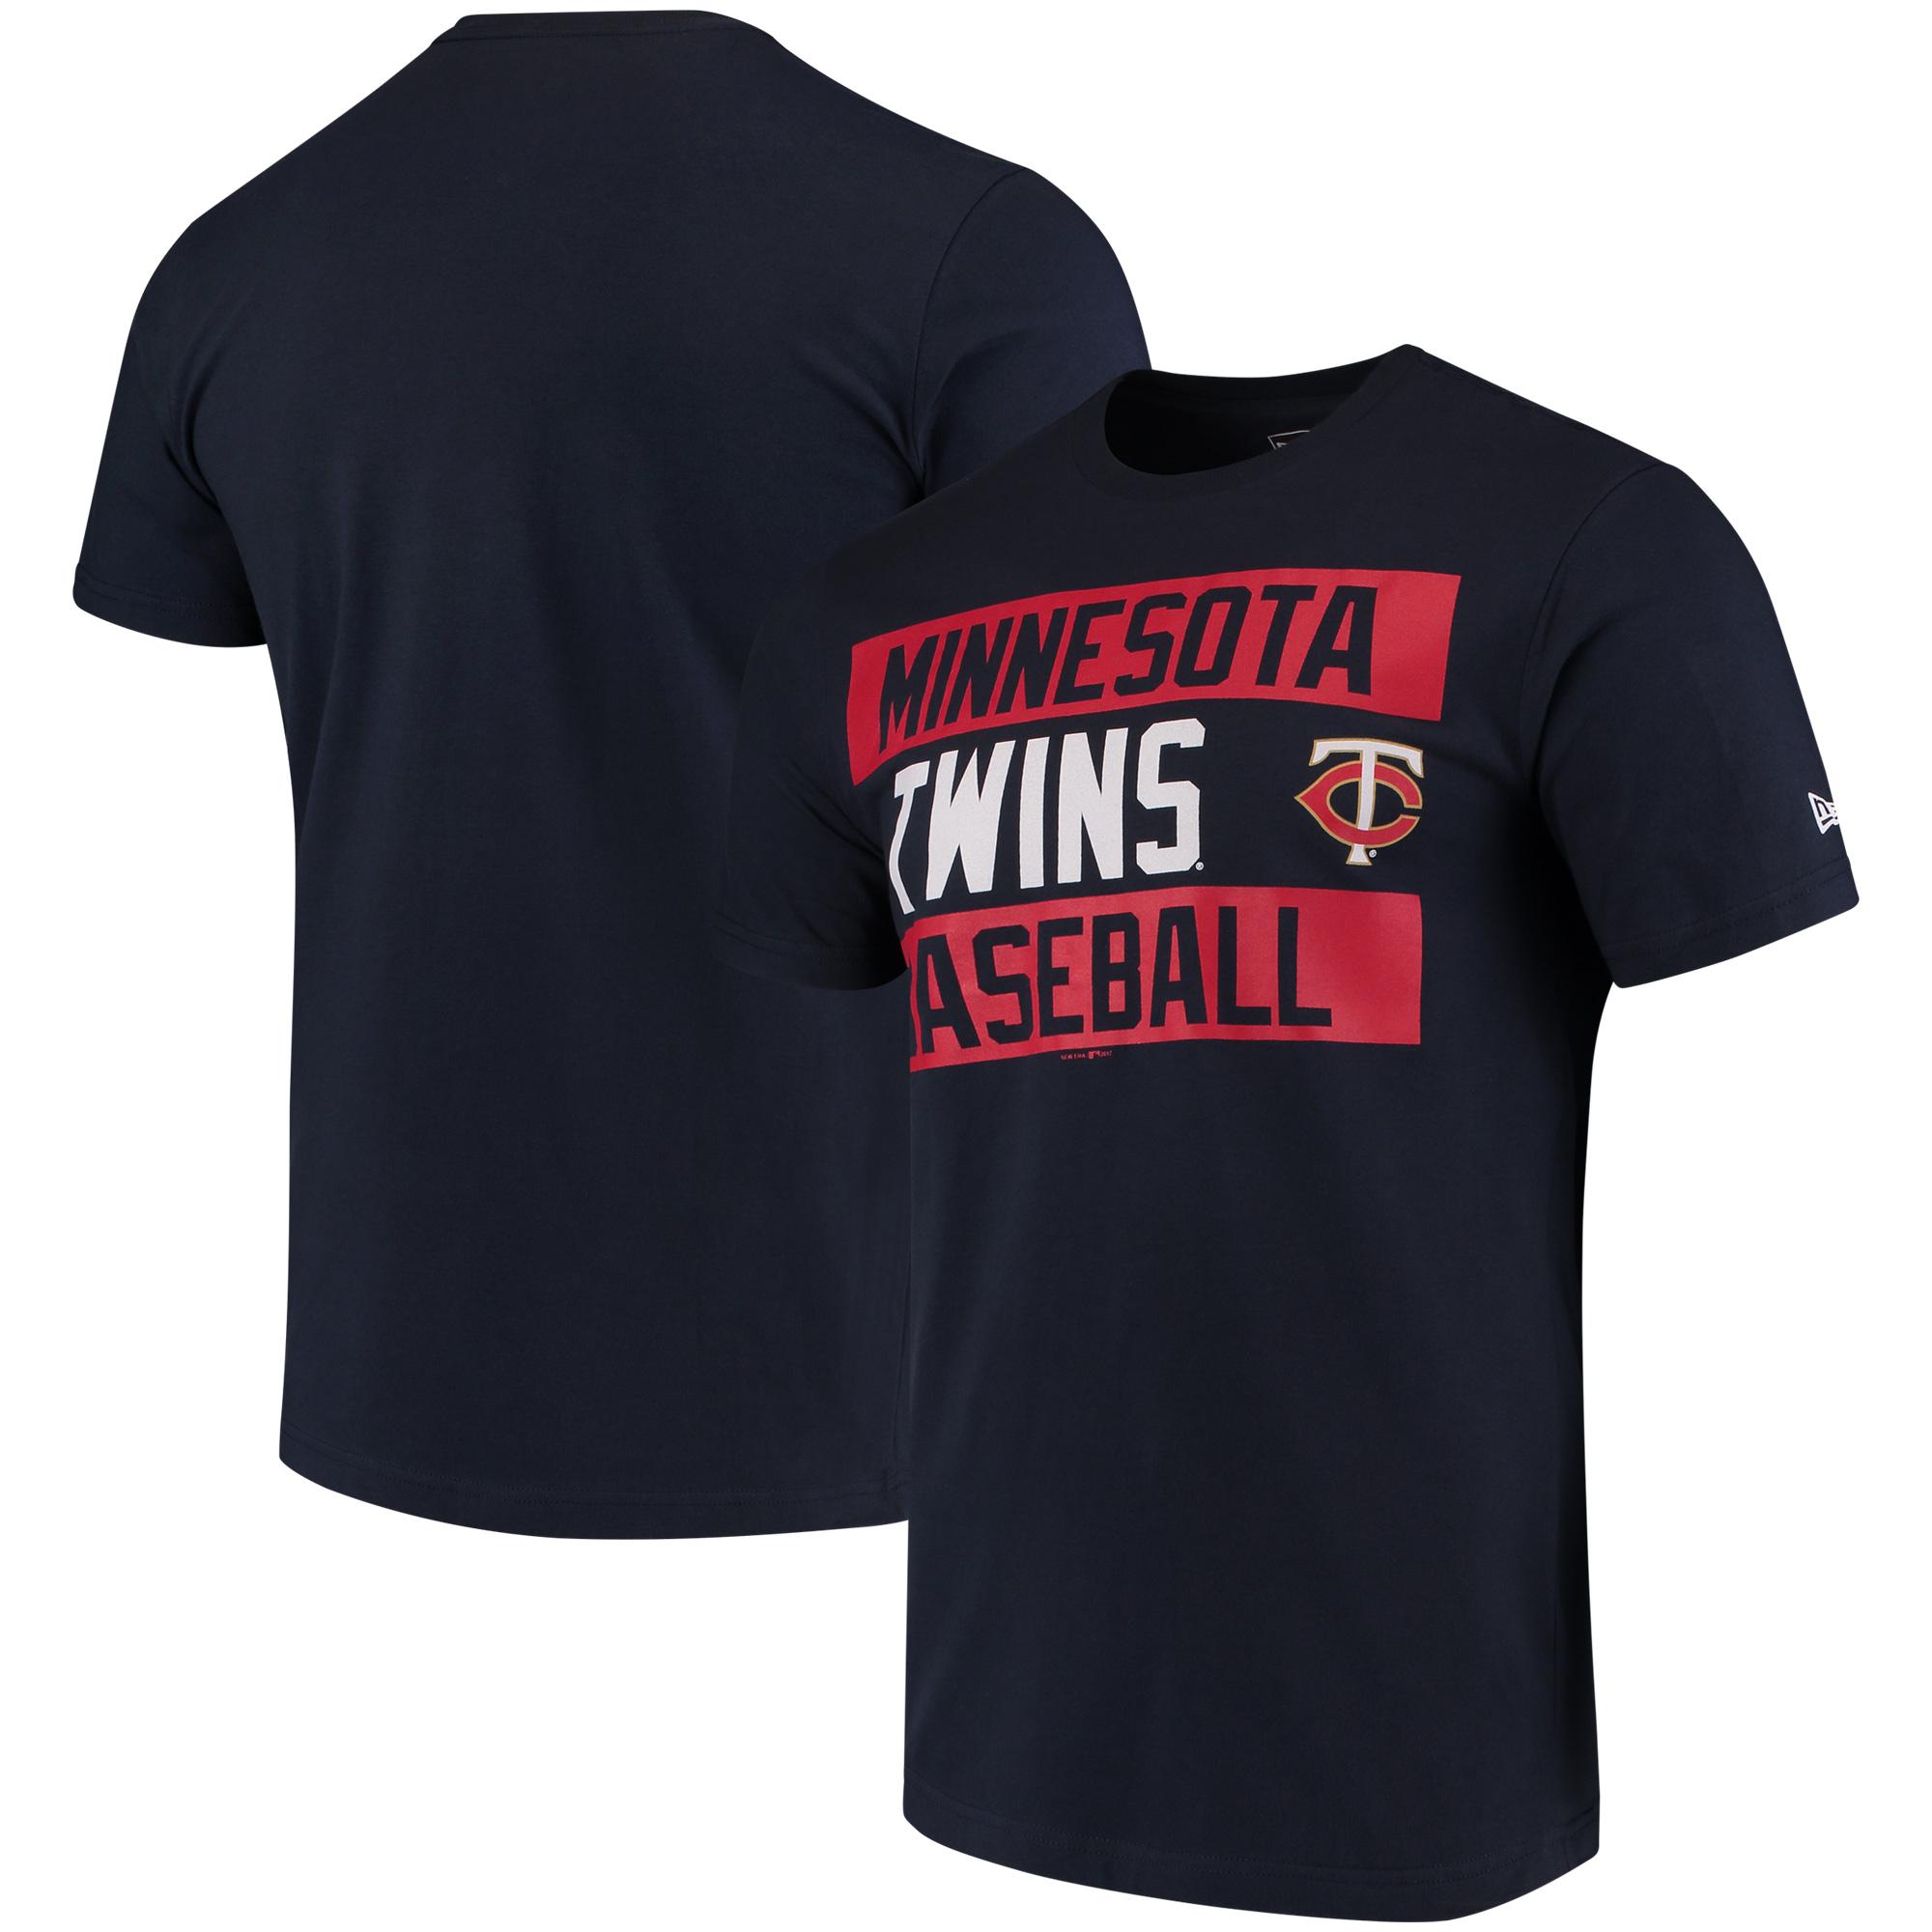 Minnesota Twins New Era Bars Jersey T-Shirt - Navy